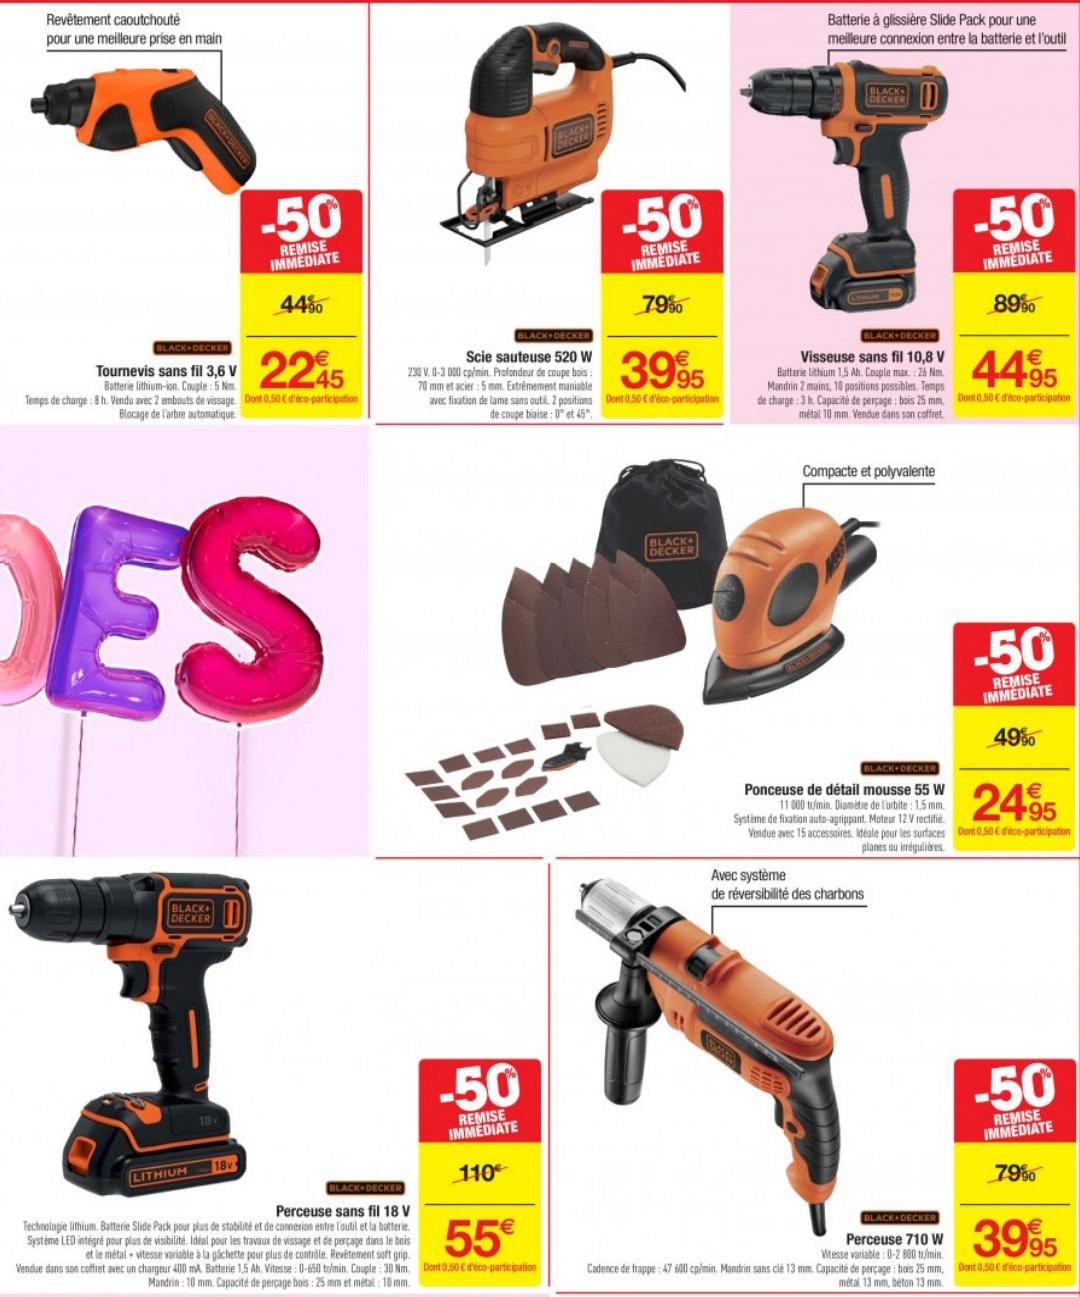 s lection de produits sold s ex tv 43 hitachi 43f501hk4w04 4k led barbecues gaz outils. Black Bedroom Furniture Sets. Home Design Ideas